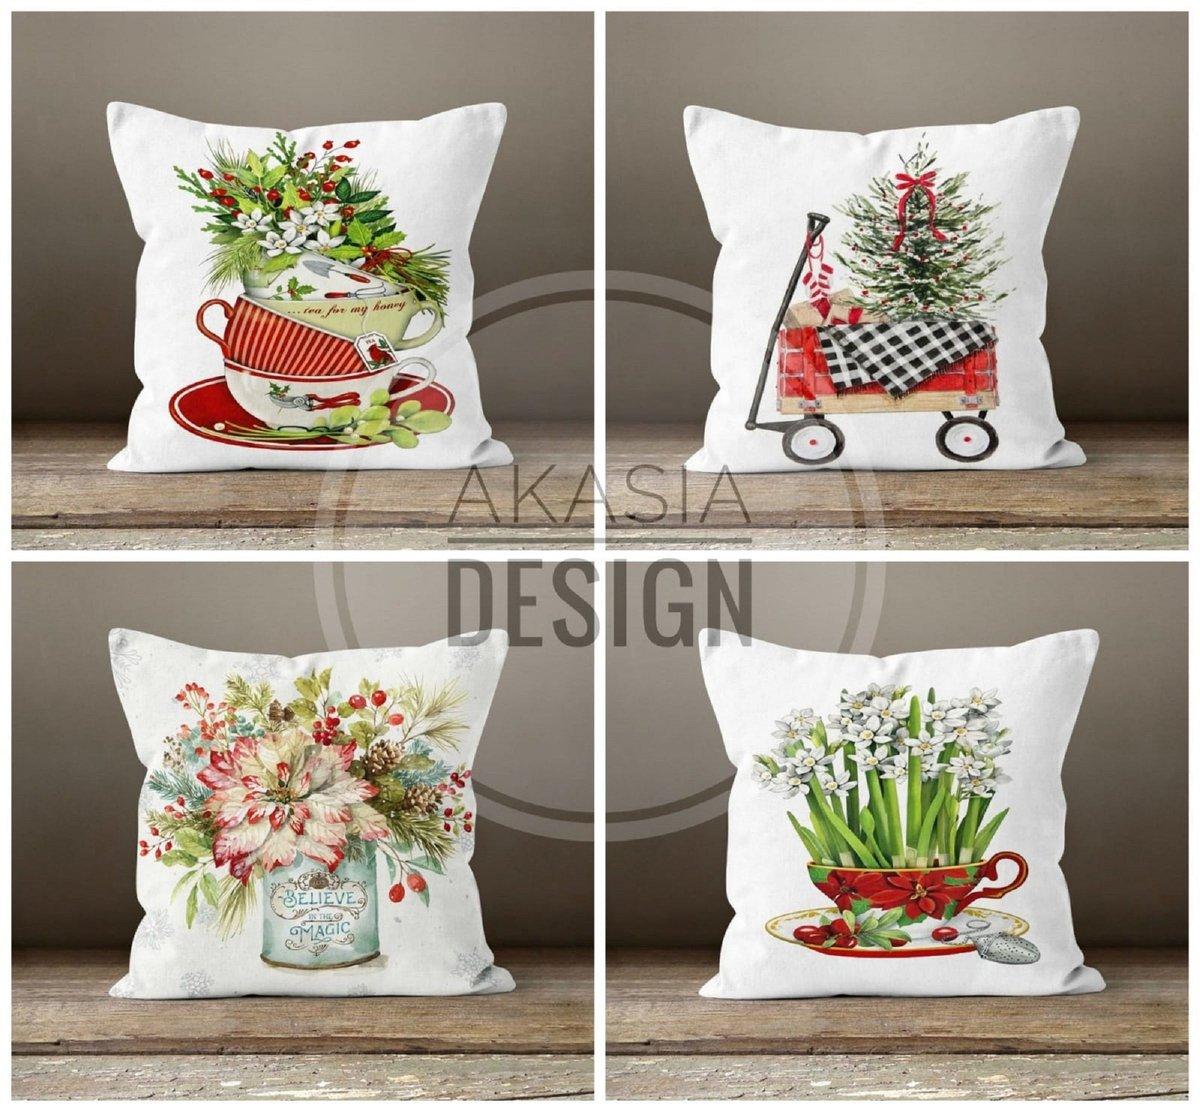 Latest addition to my #etsyshop :Christmas Pillow Covers#happyholiday #xmasdecorideas #christmastree #xmasgiftideas #pillowcovers #merrychristmas #etsy #wintertrend #xmas #xmashomedecor #redberry #xmasbell #floral #happynewyear #outdoorpillows #christmasdecor @Etsy https://t.co/wqLDsGmF6m